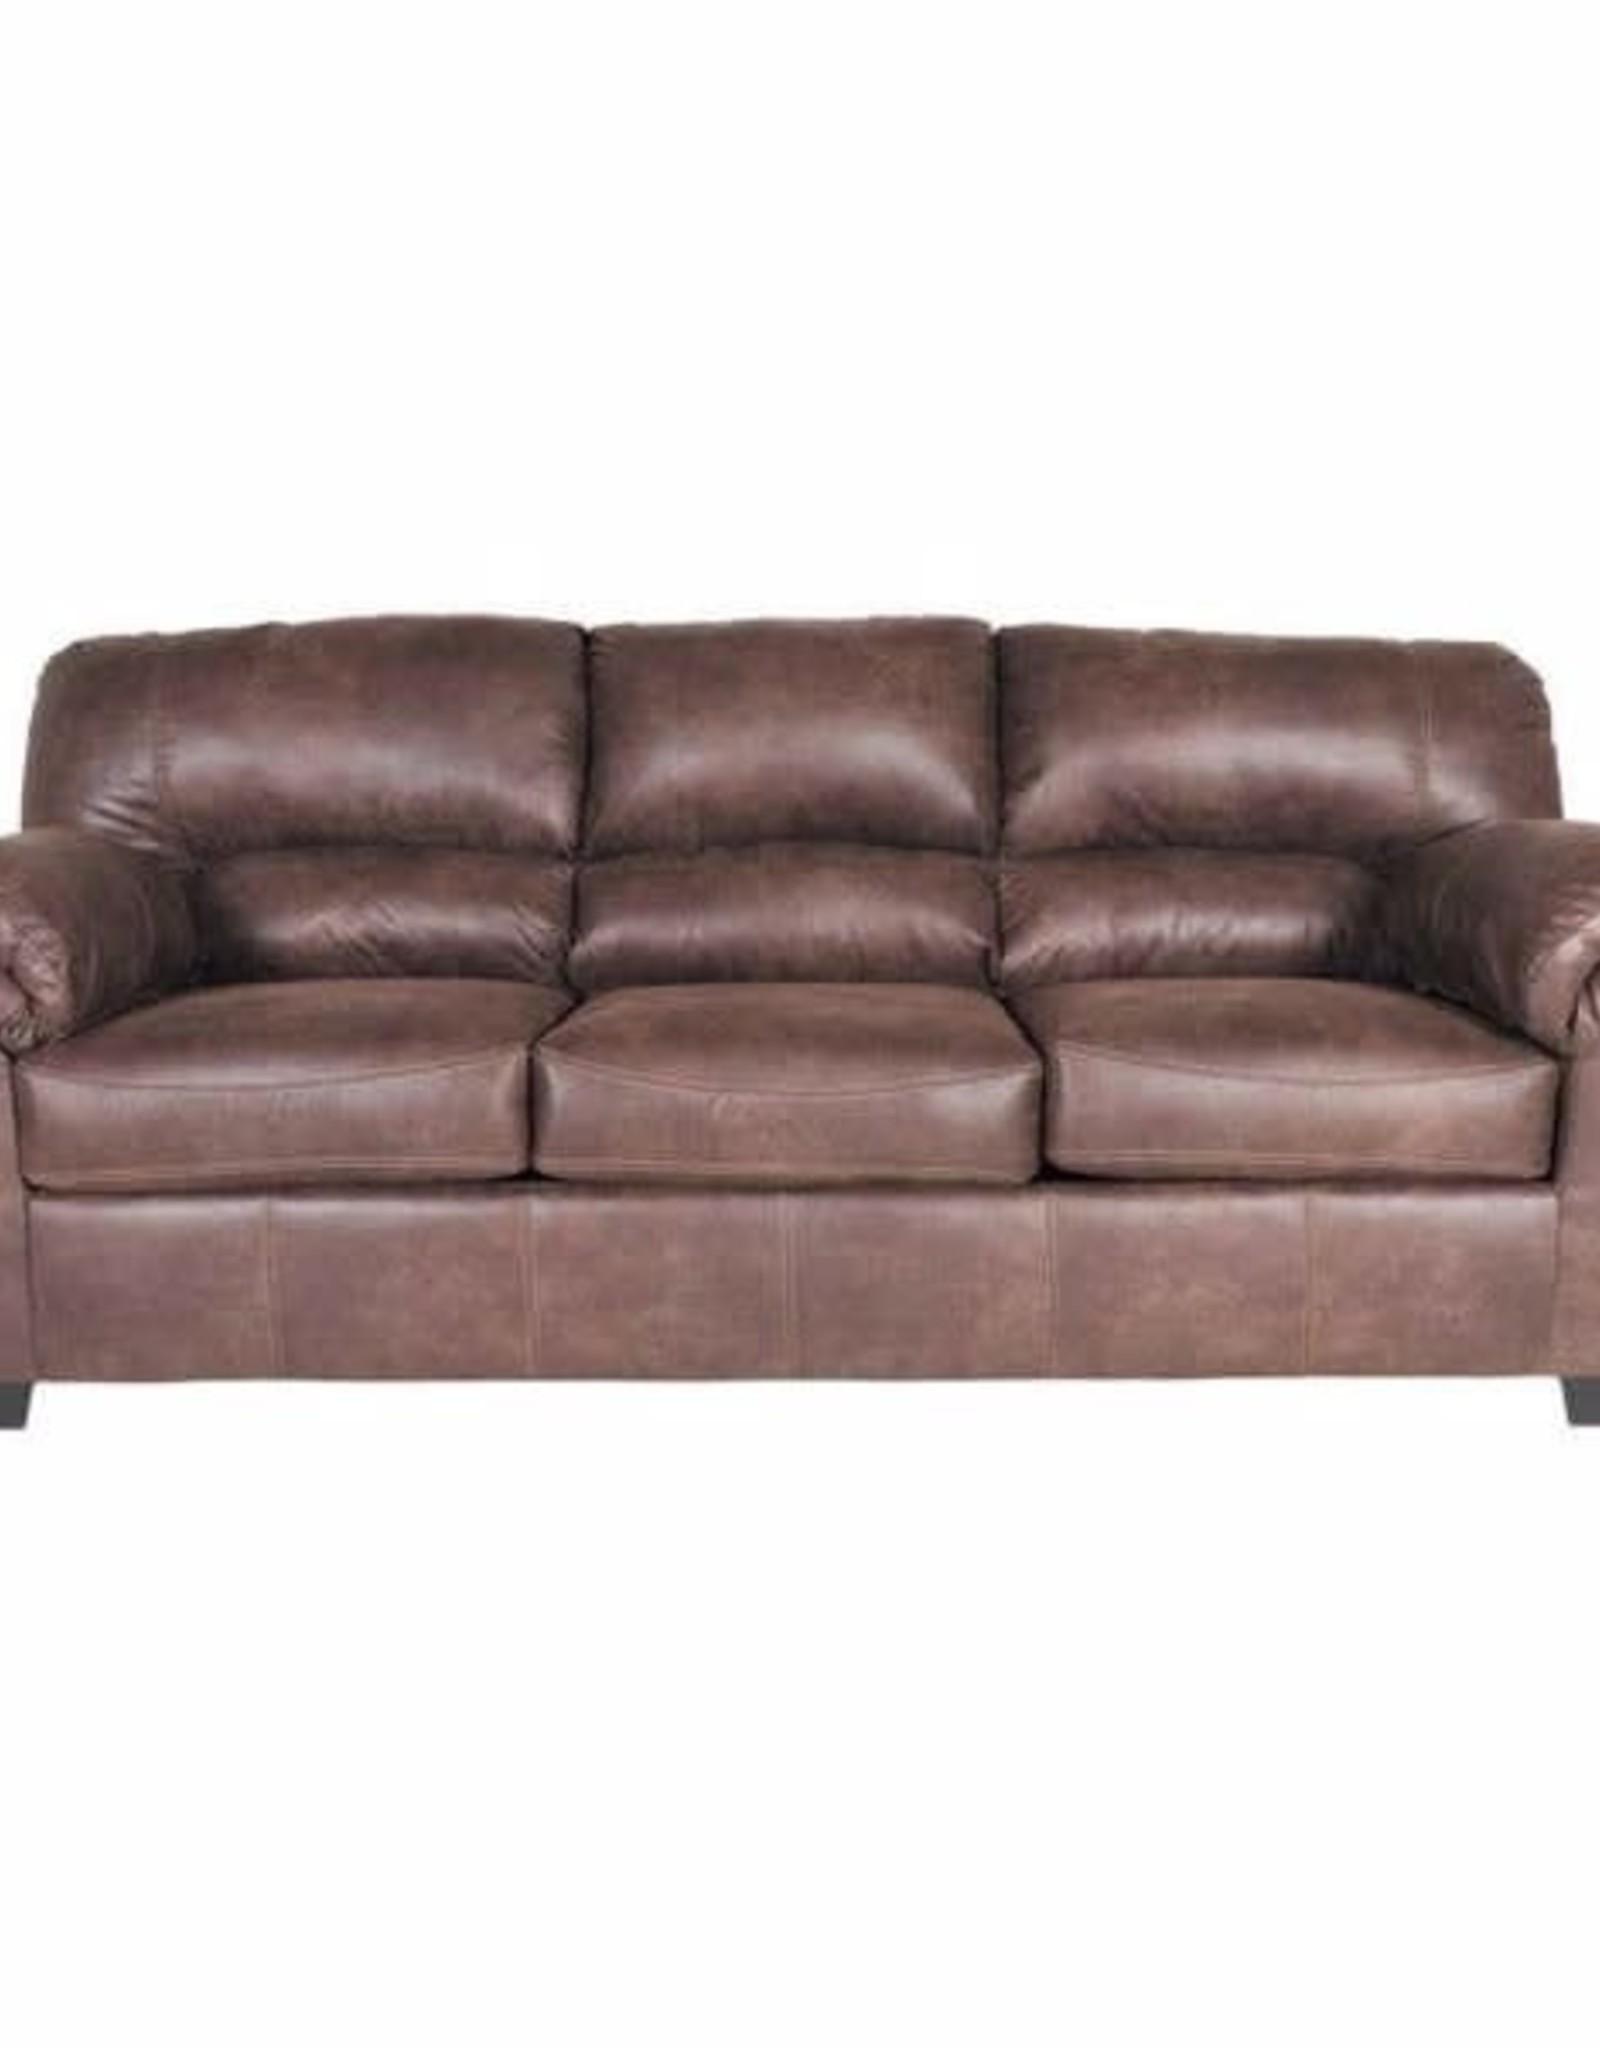 CLOSEOUT: Bladen Coffee Sofa